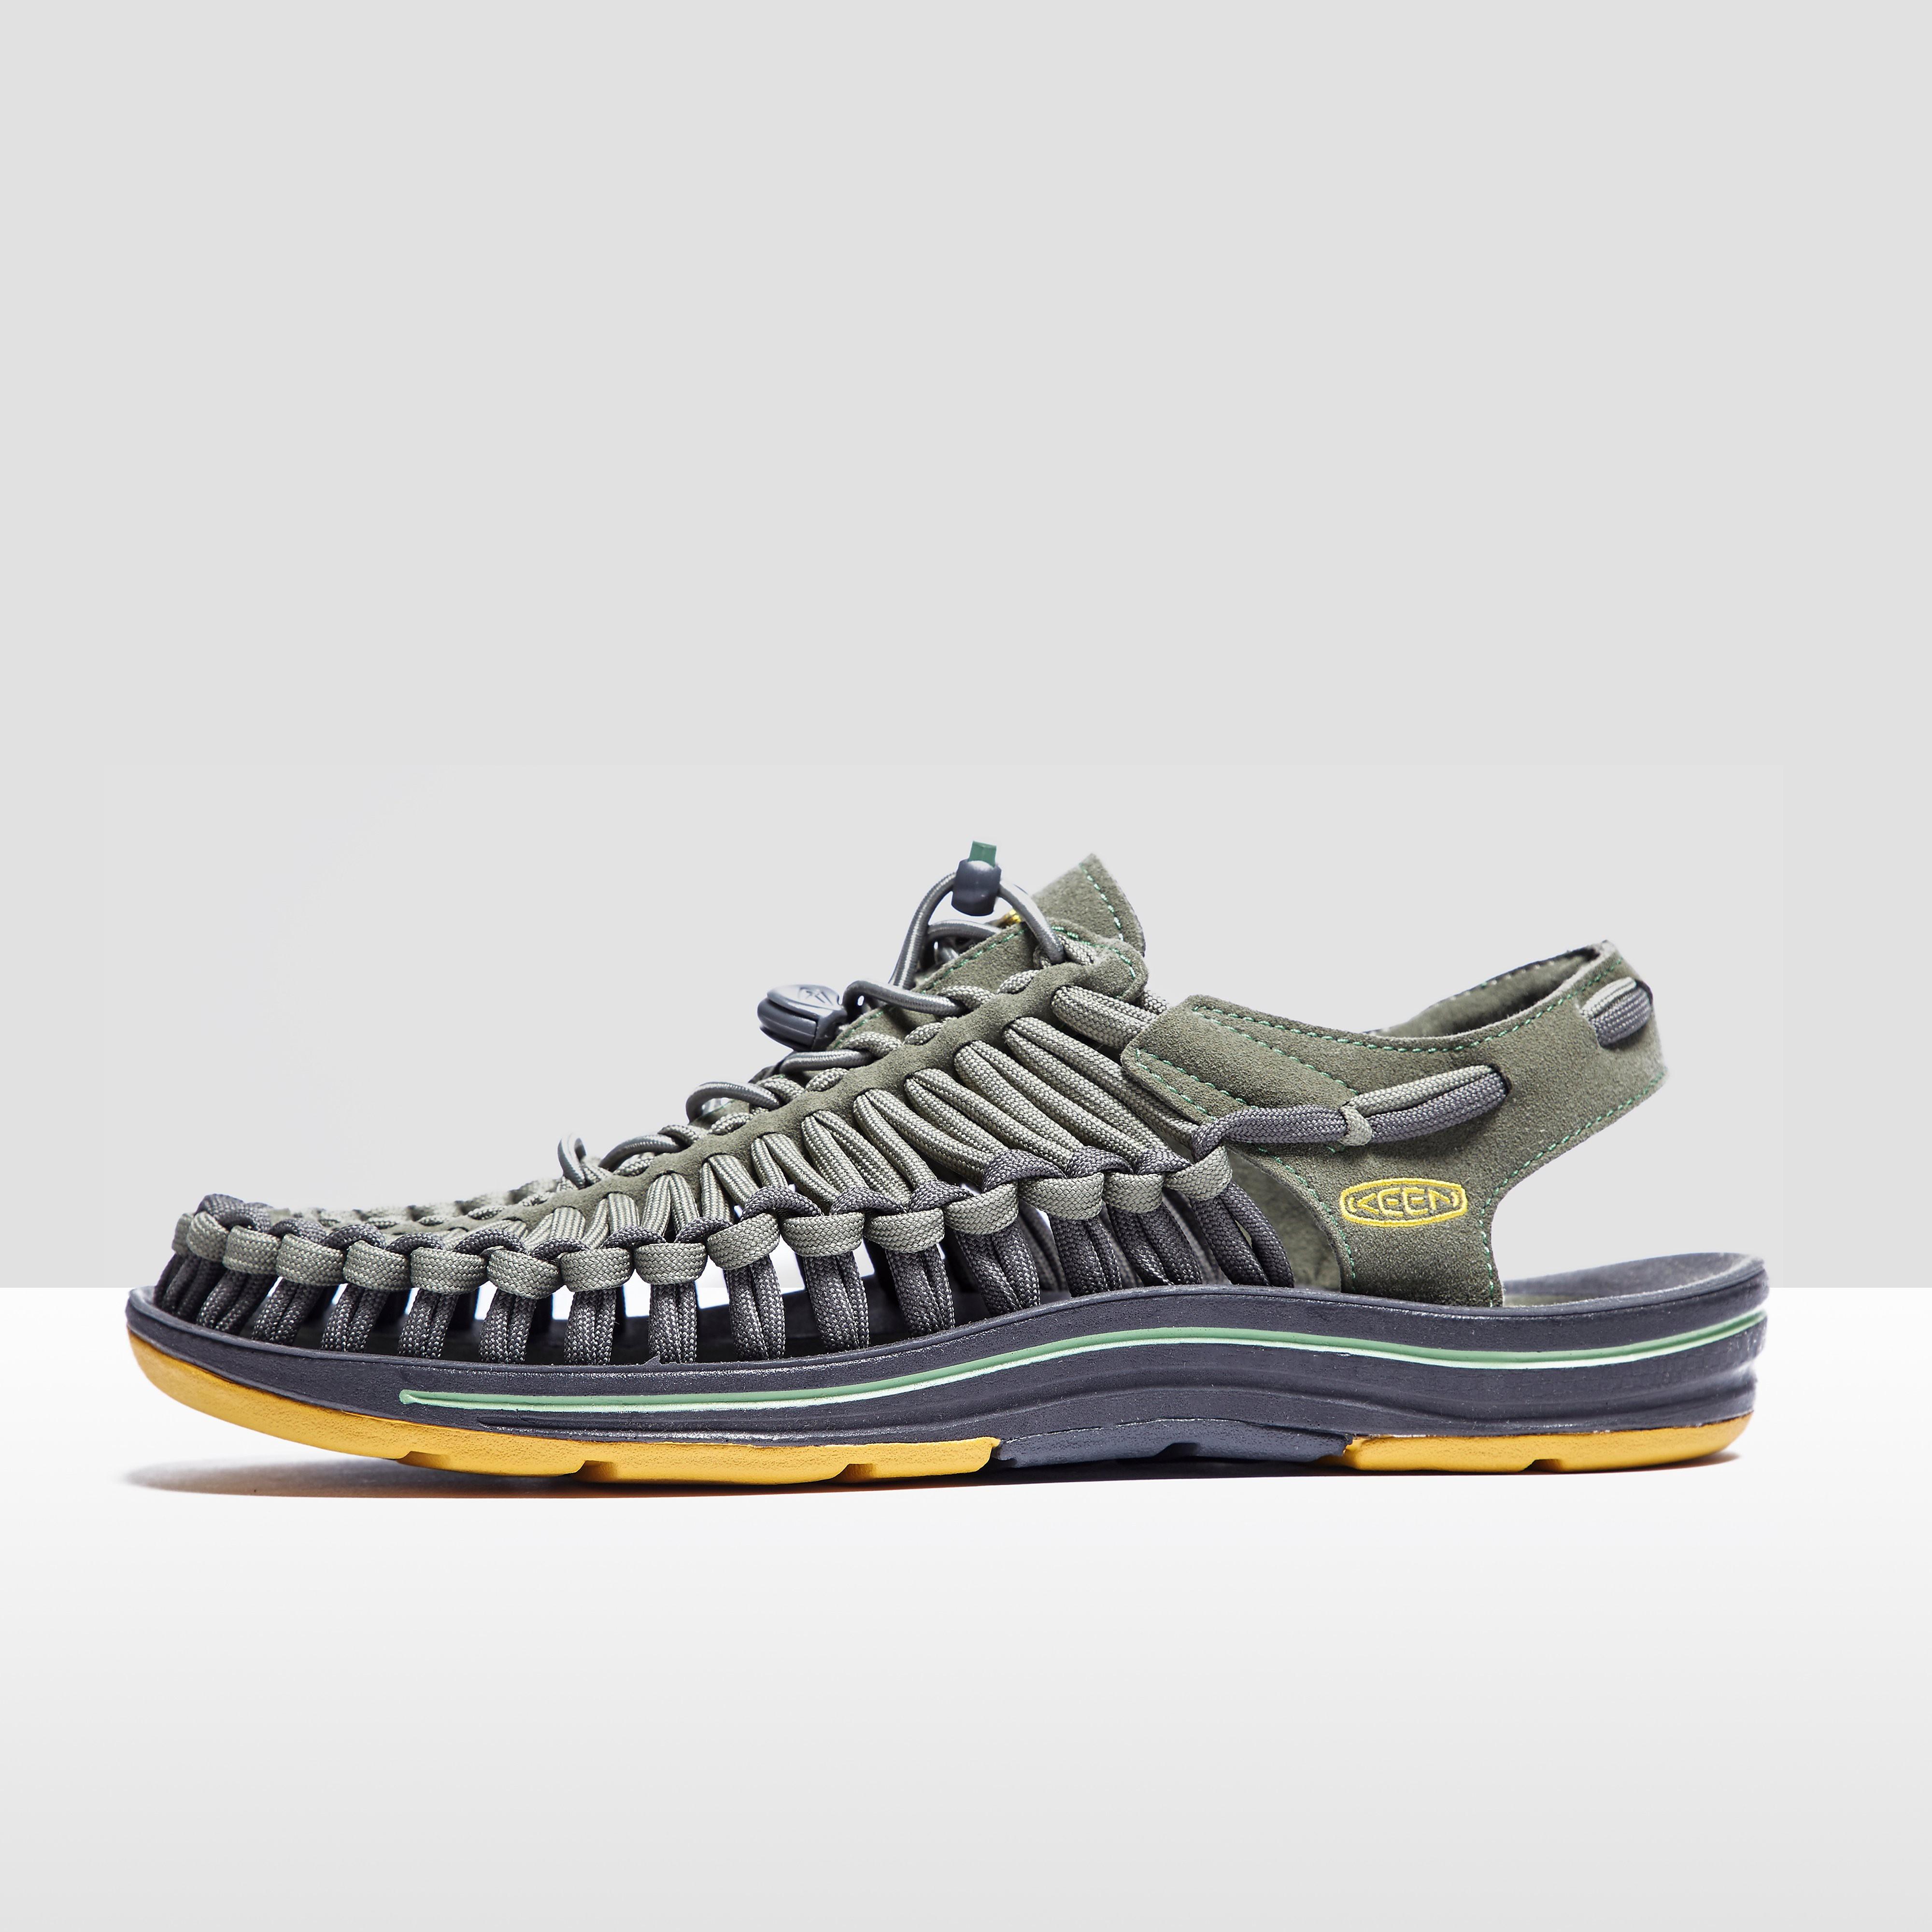 Keen Uneek Flat Cord Men's Sandals